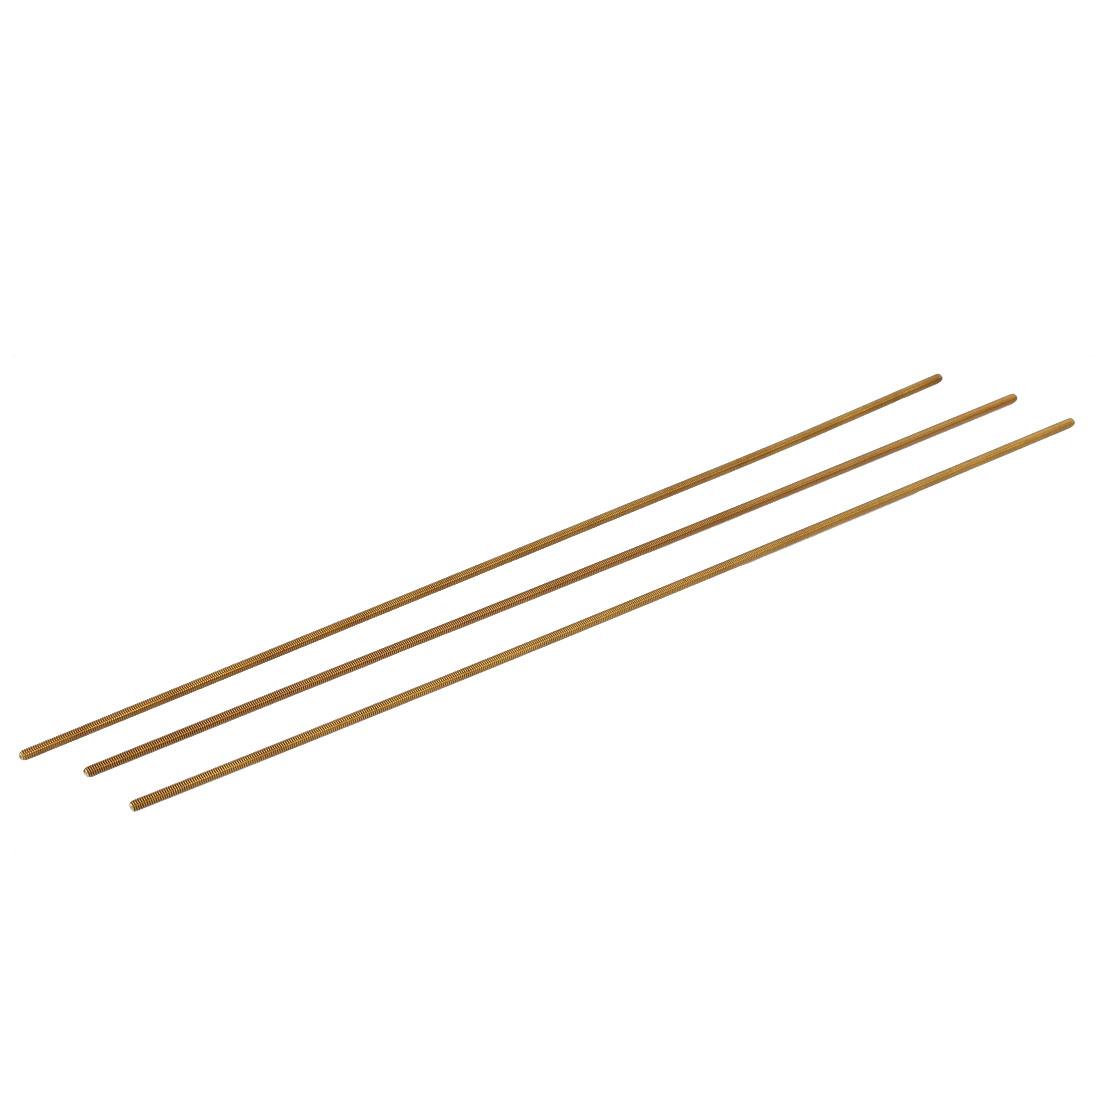 M2.5 x 250mm Male Threaded 0.5mm Pitch All Thread Brass Rod Bars Hardware 3 Pcs